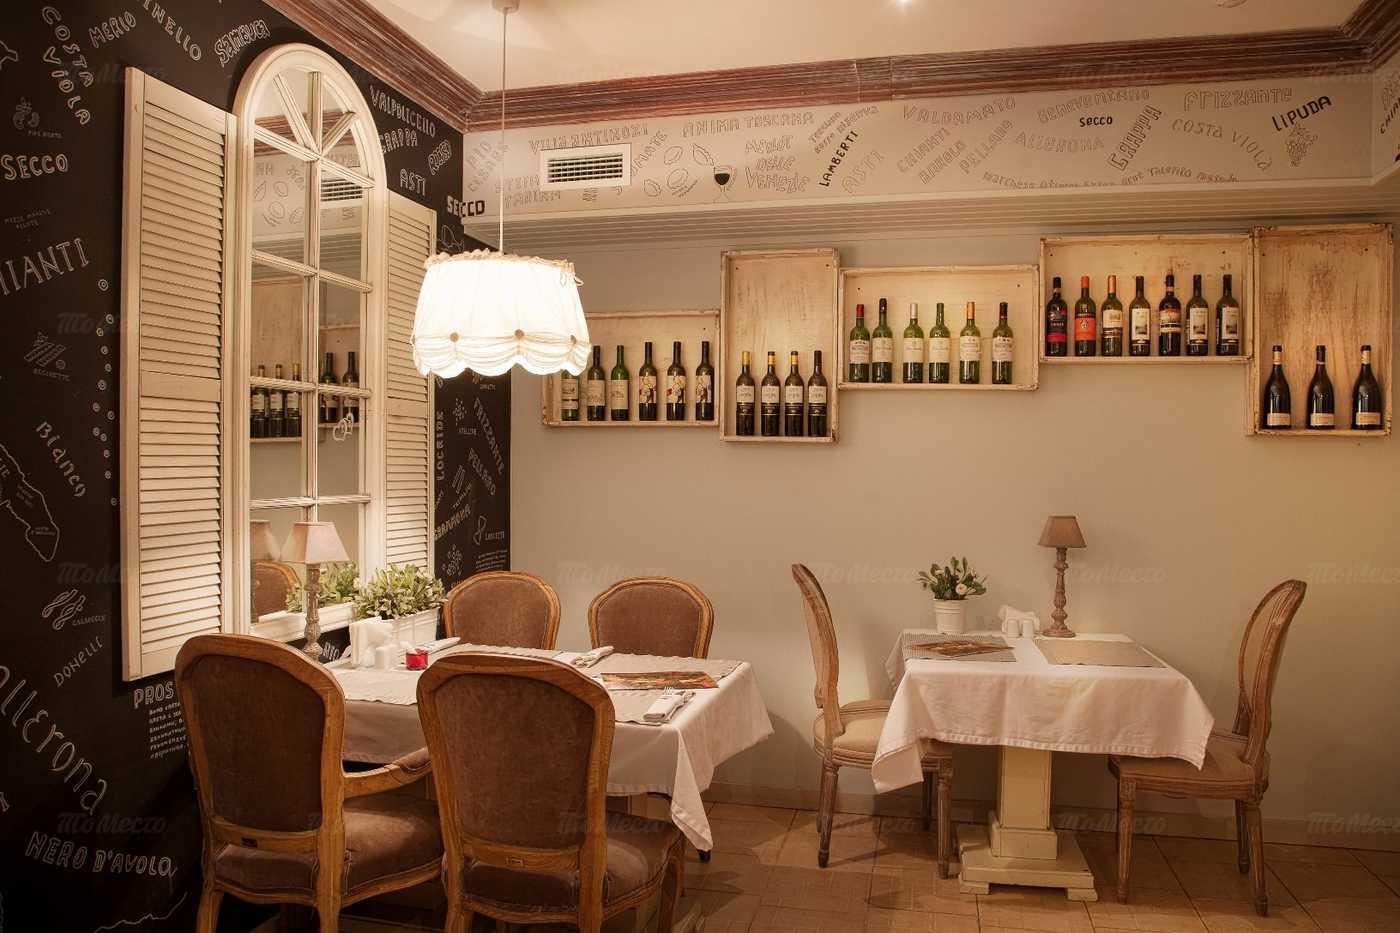 Ресторан Папа Пицциано (Papa Pizziano) на Новочеркасском проспекте фото 2